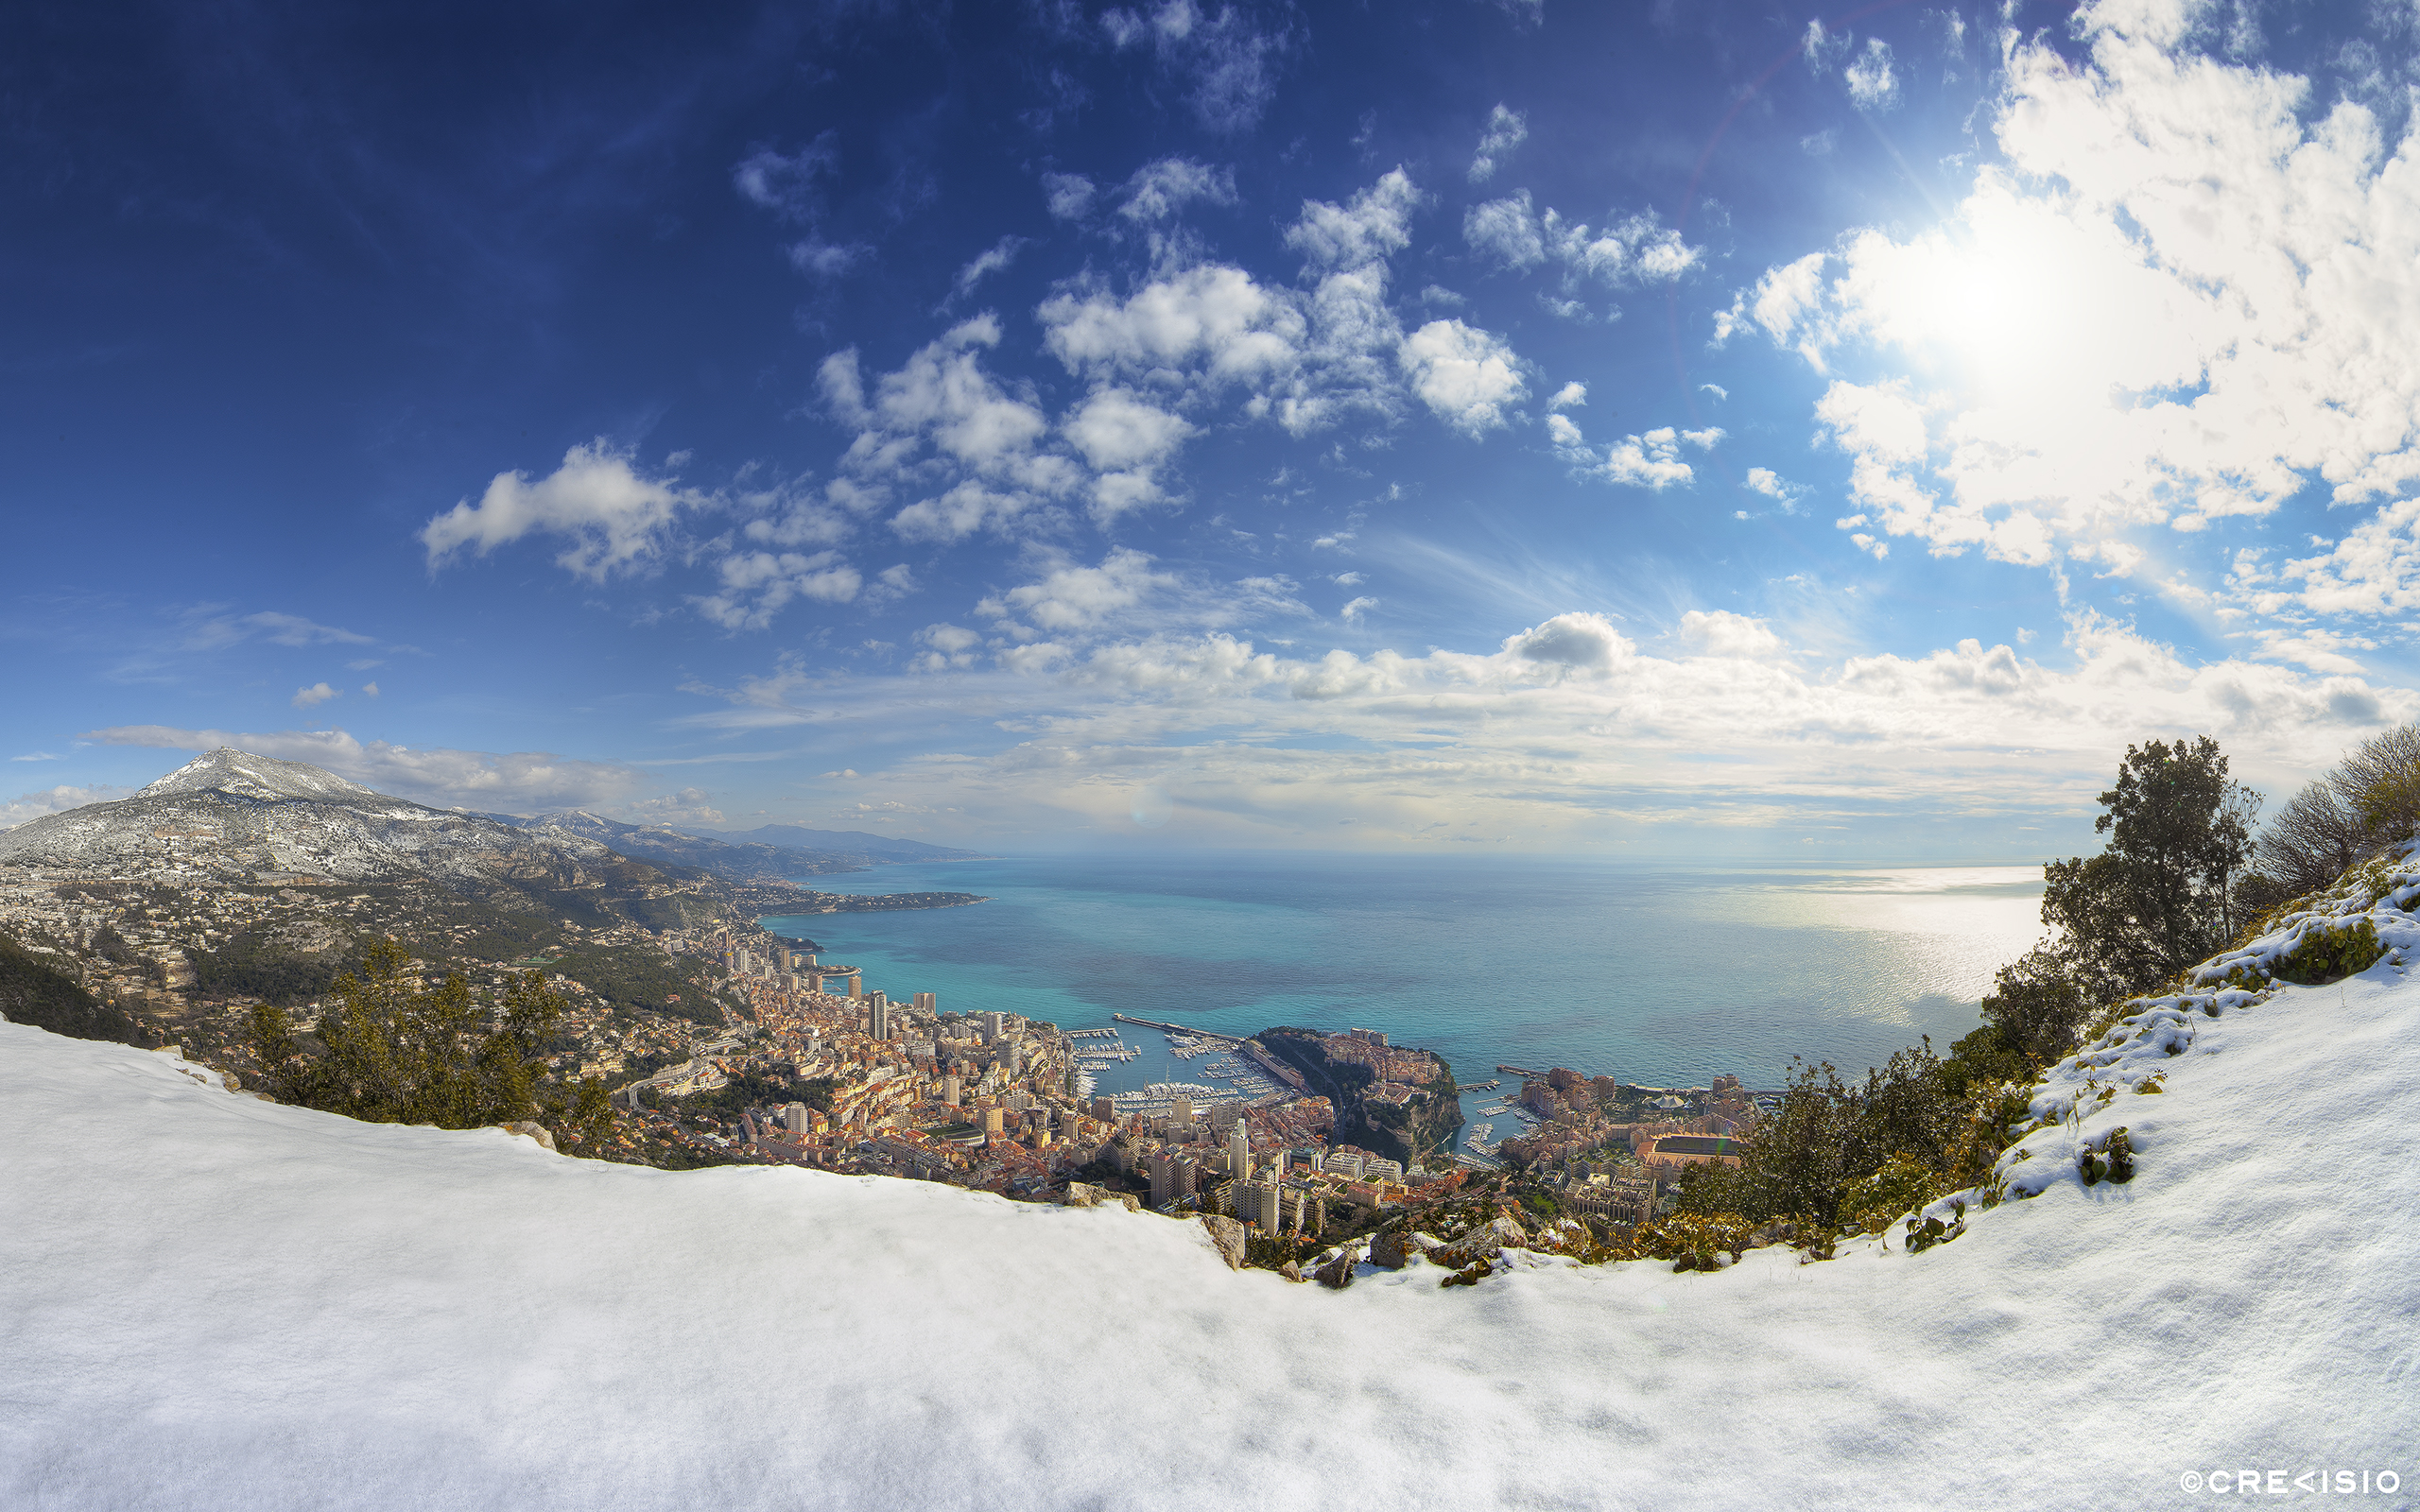 HD Wallpapers Principality of Monaco